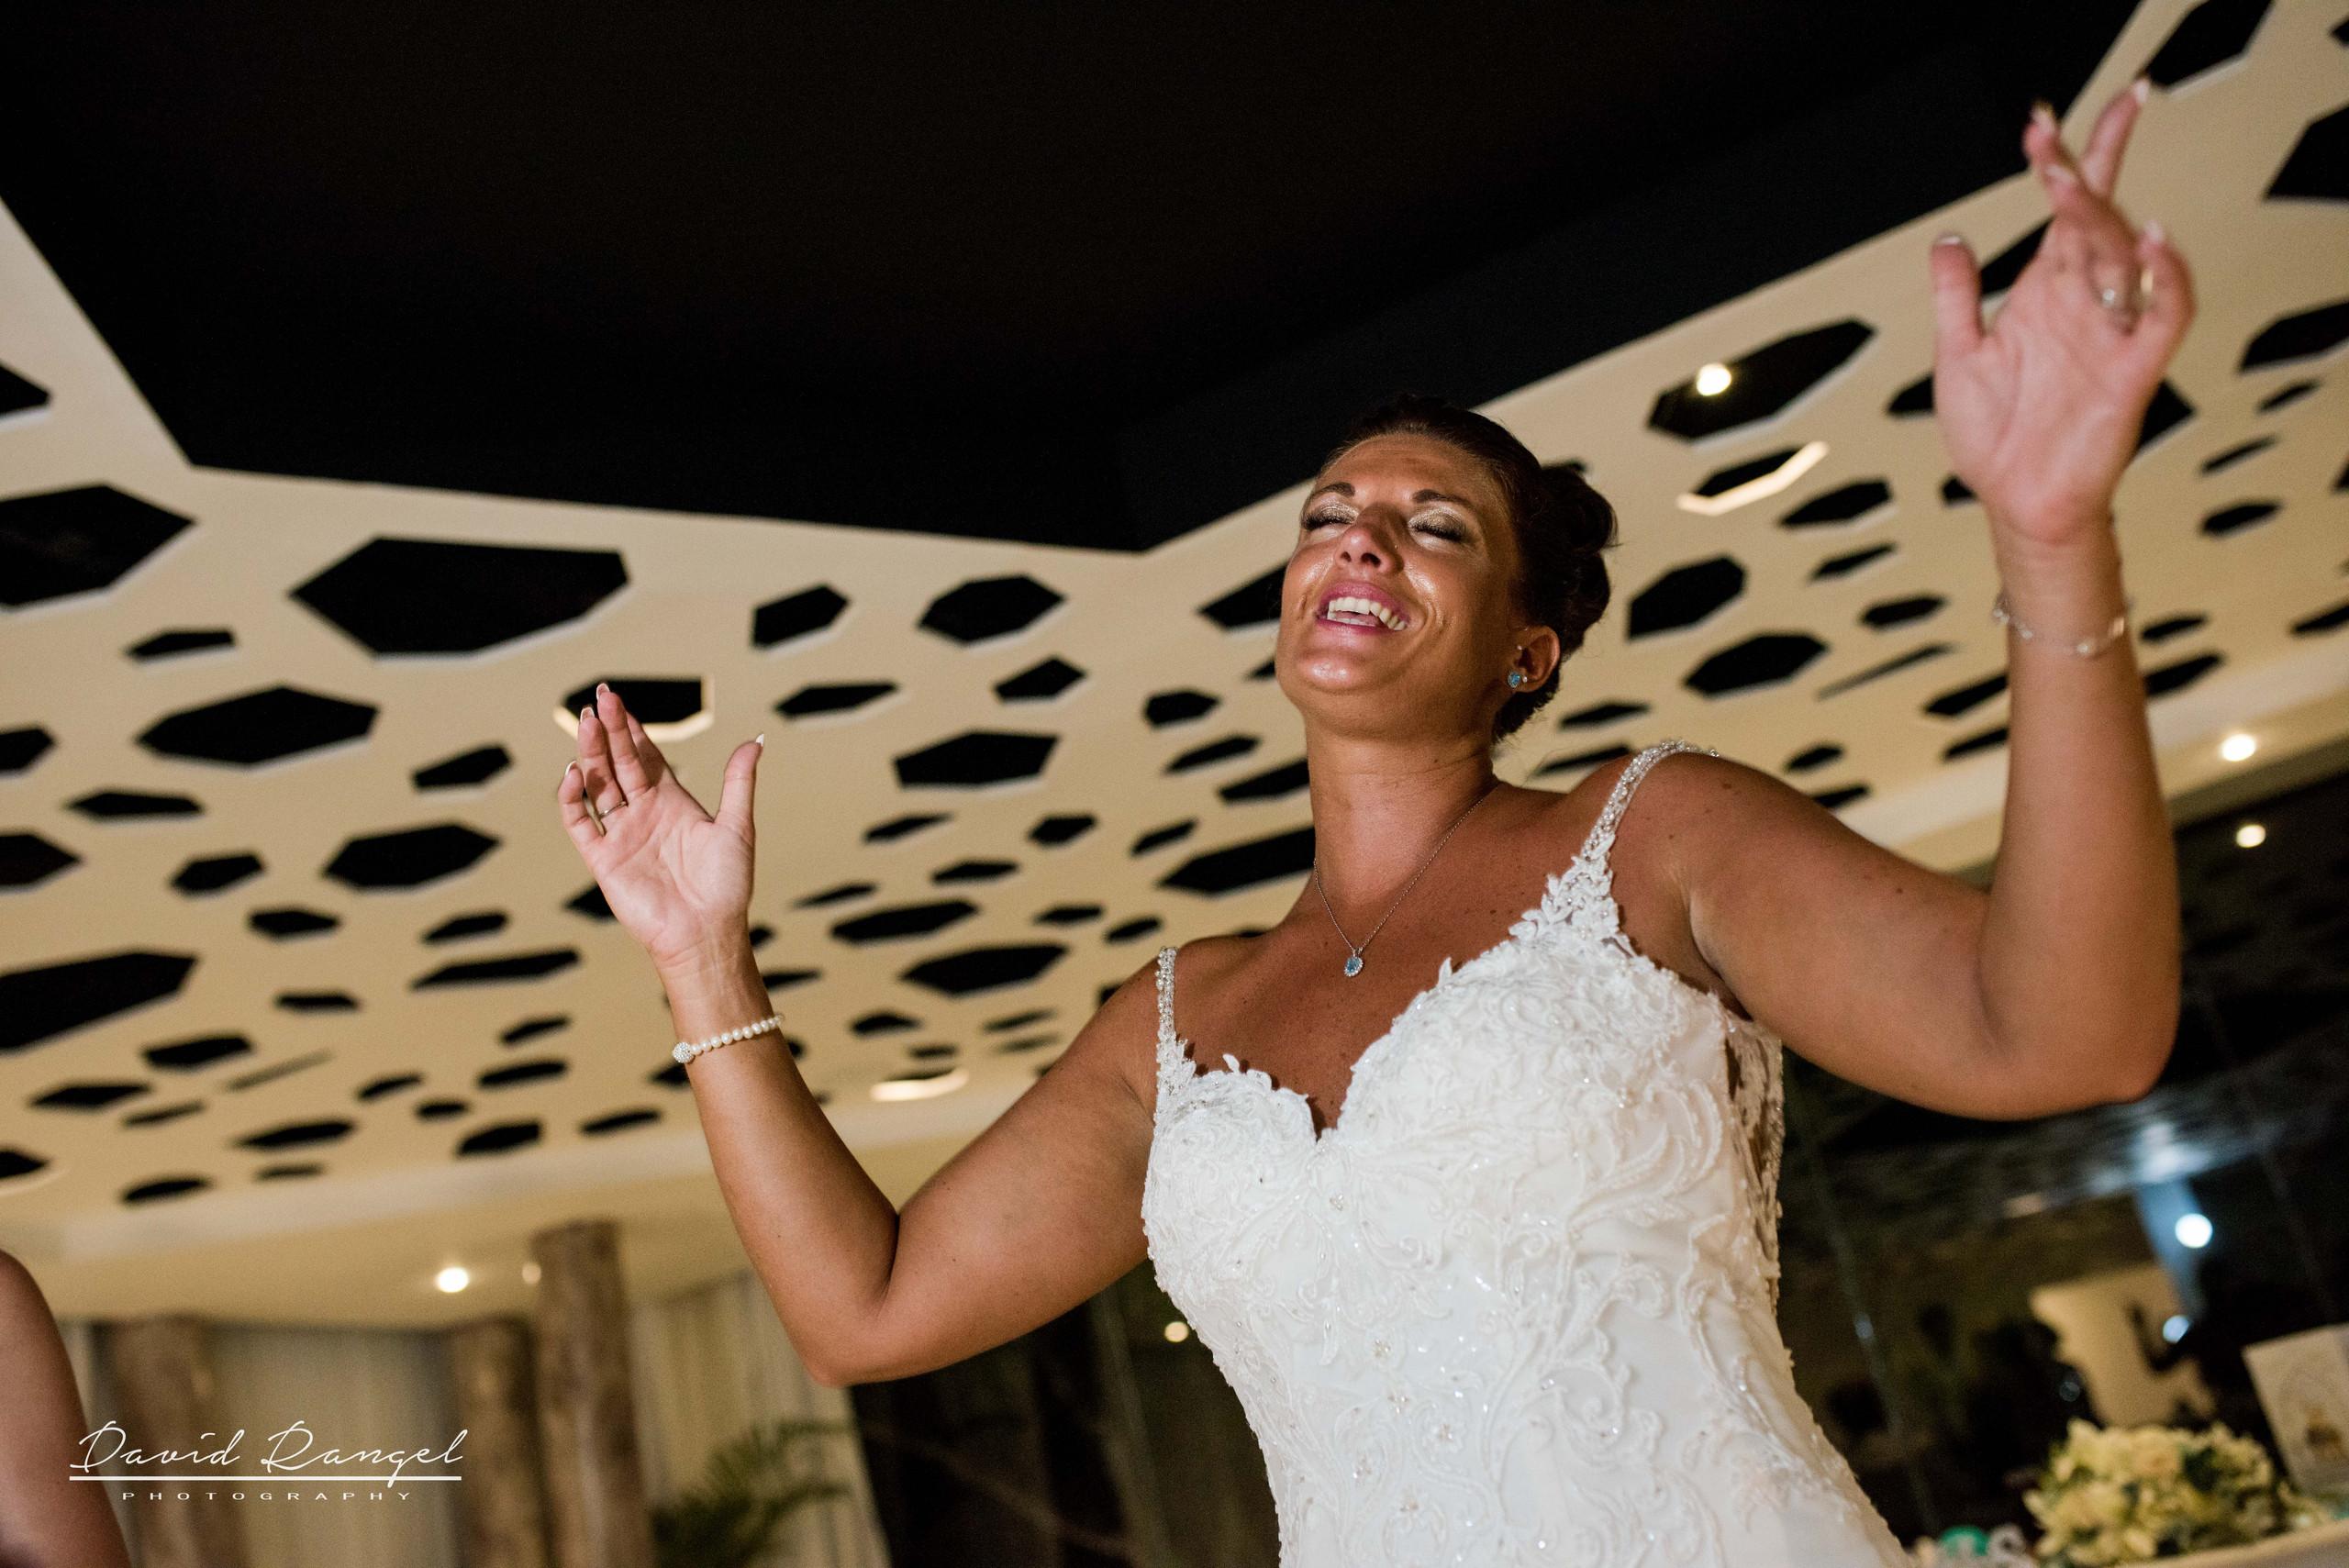 bride+singing+reception+dance+floor+photo